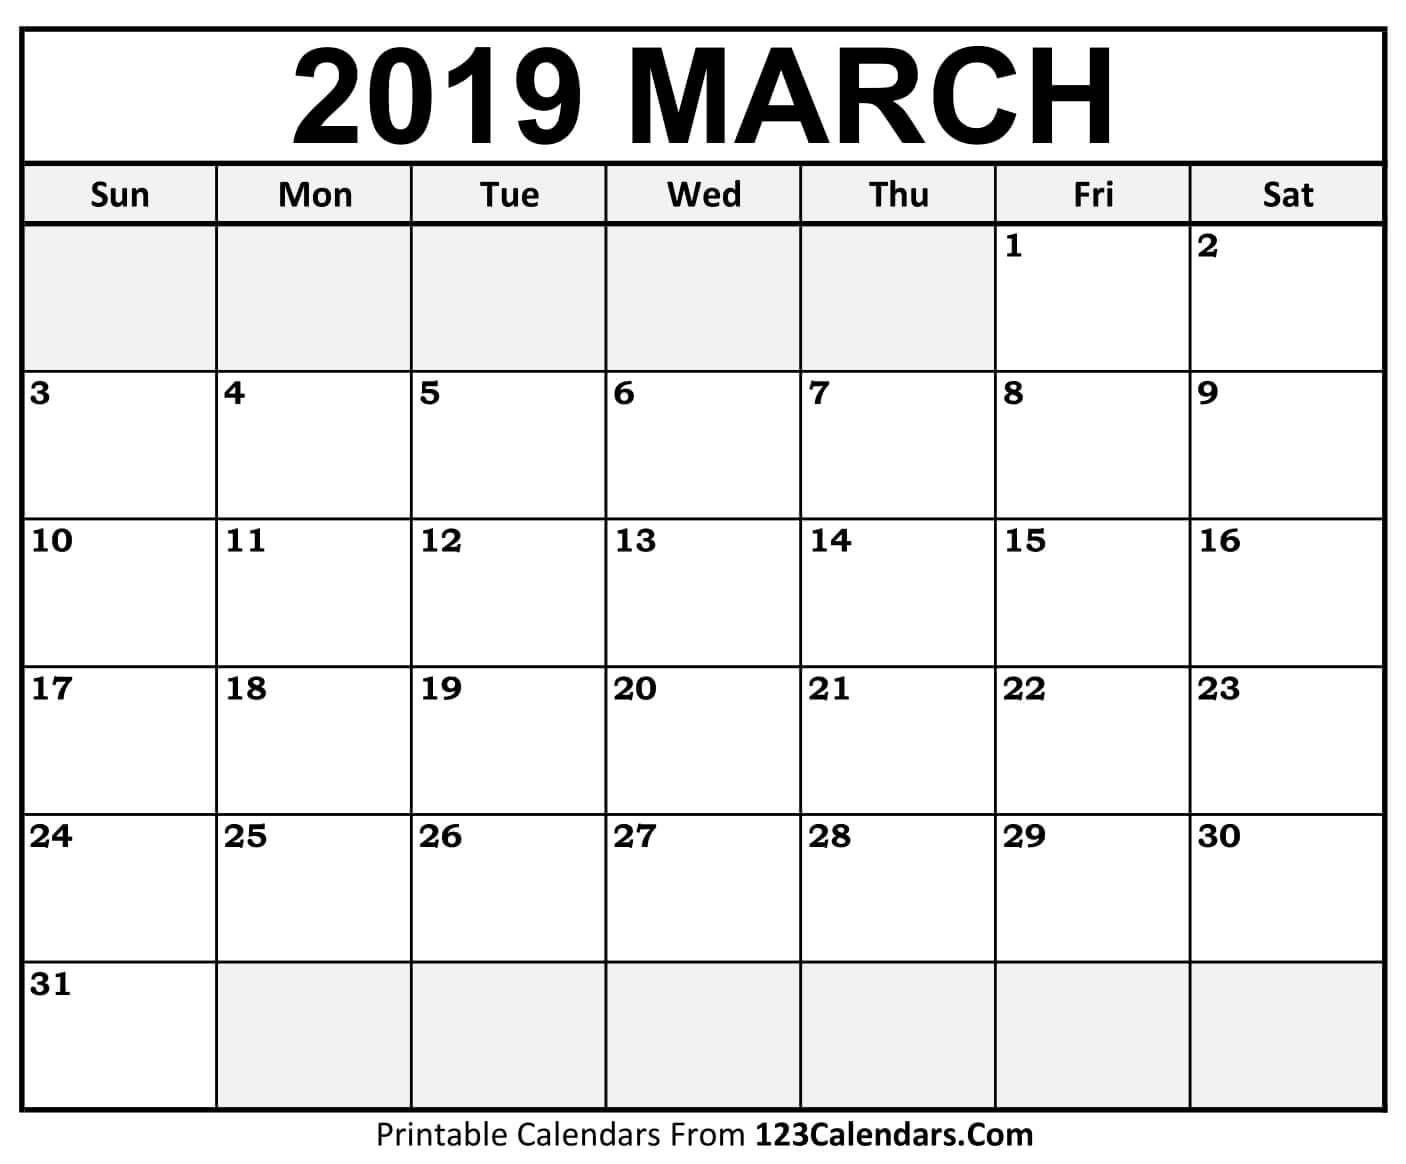 March 2019 Printable Calendar | Free March 2019 Calendar Printable with Blank Printable Calendar March